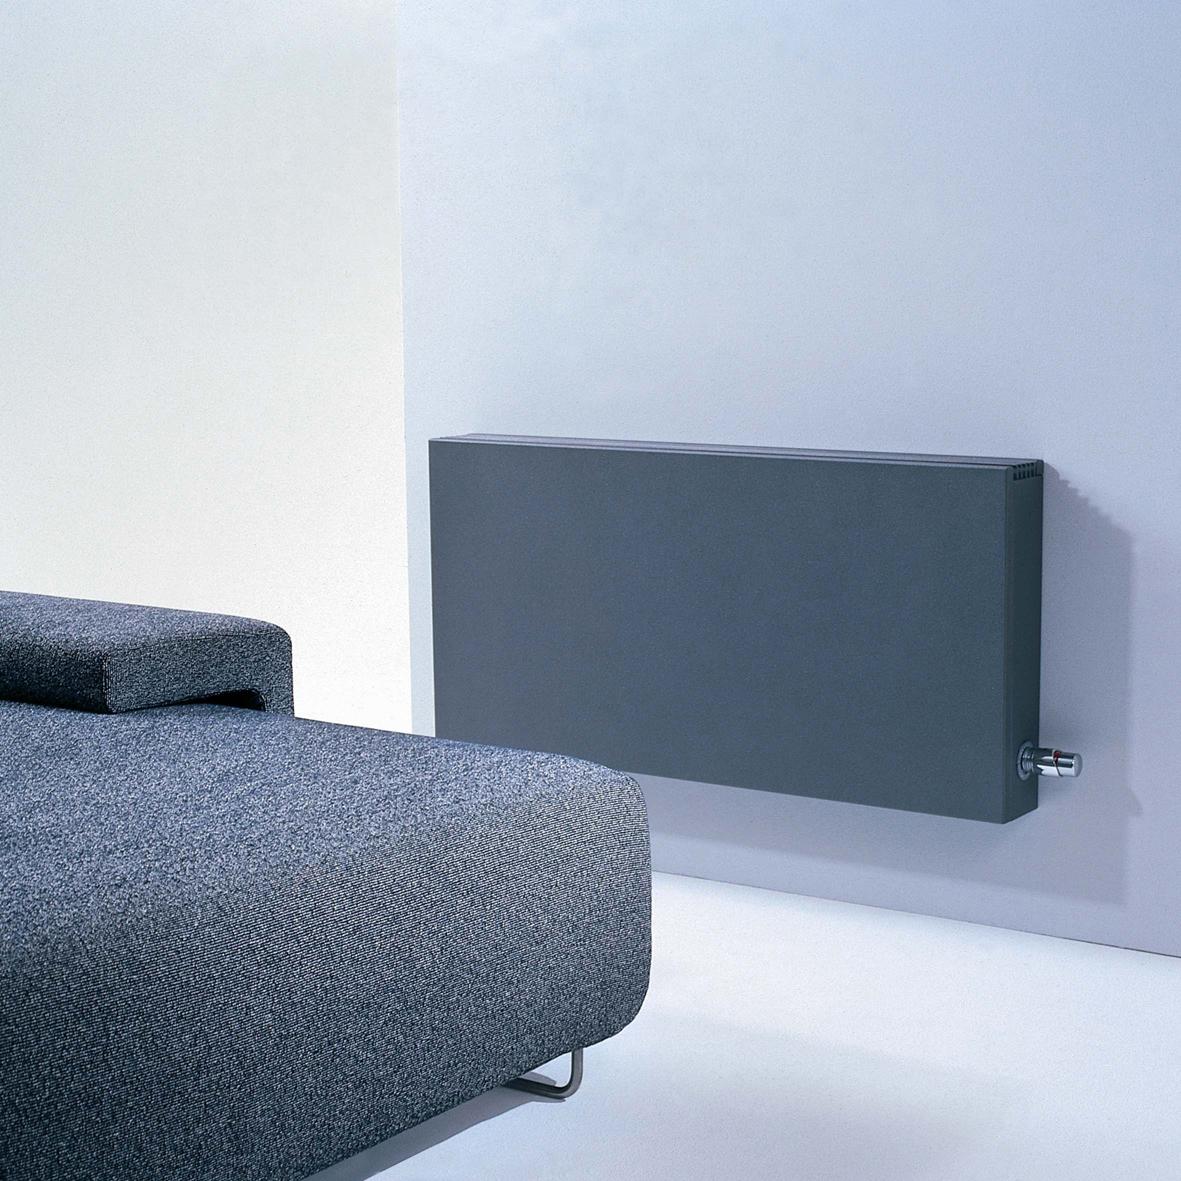 nzeb-radiator